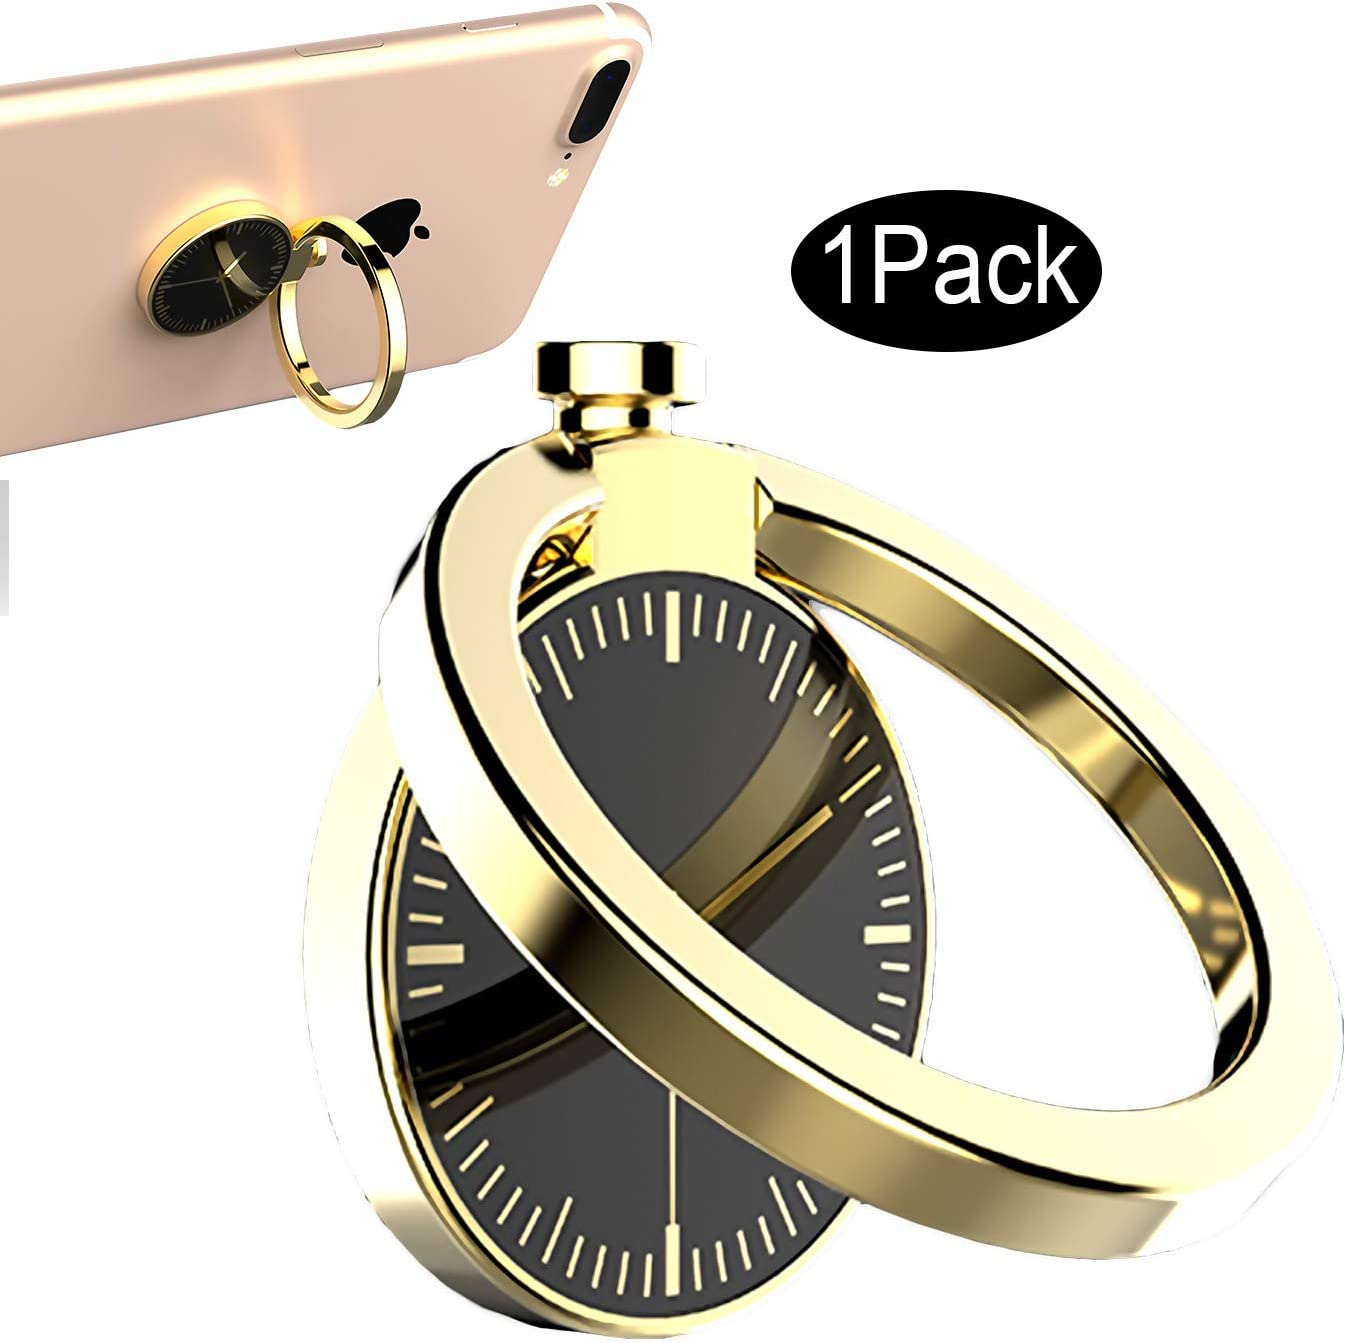 CaseHQ Gold Cell Washington Mall Phone Ring 360 5 ☆ popular Rotation Kickstand Grip Holder